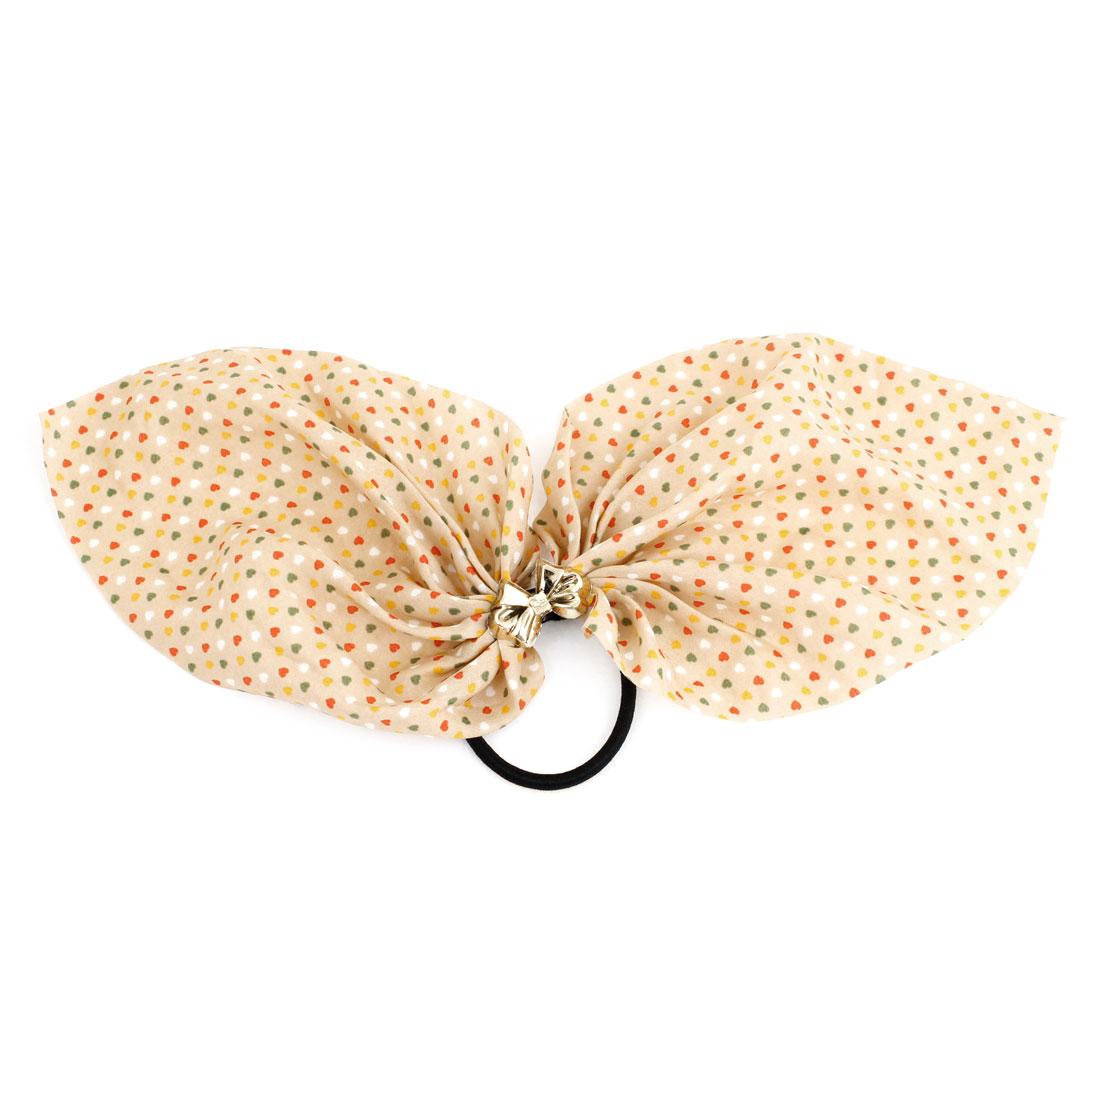 Unique Bargains Multicolored Heart Print Chiffon Accent Ponytail Holder Hair Tie Band Black Apricot Color